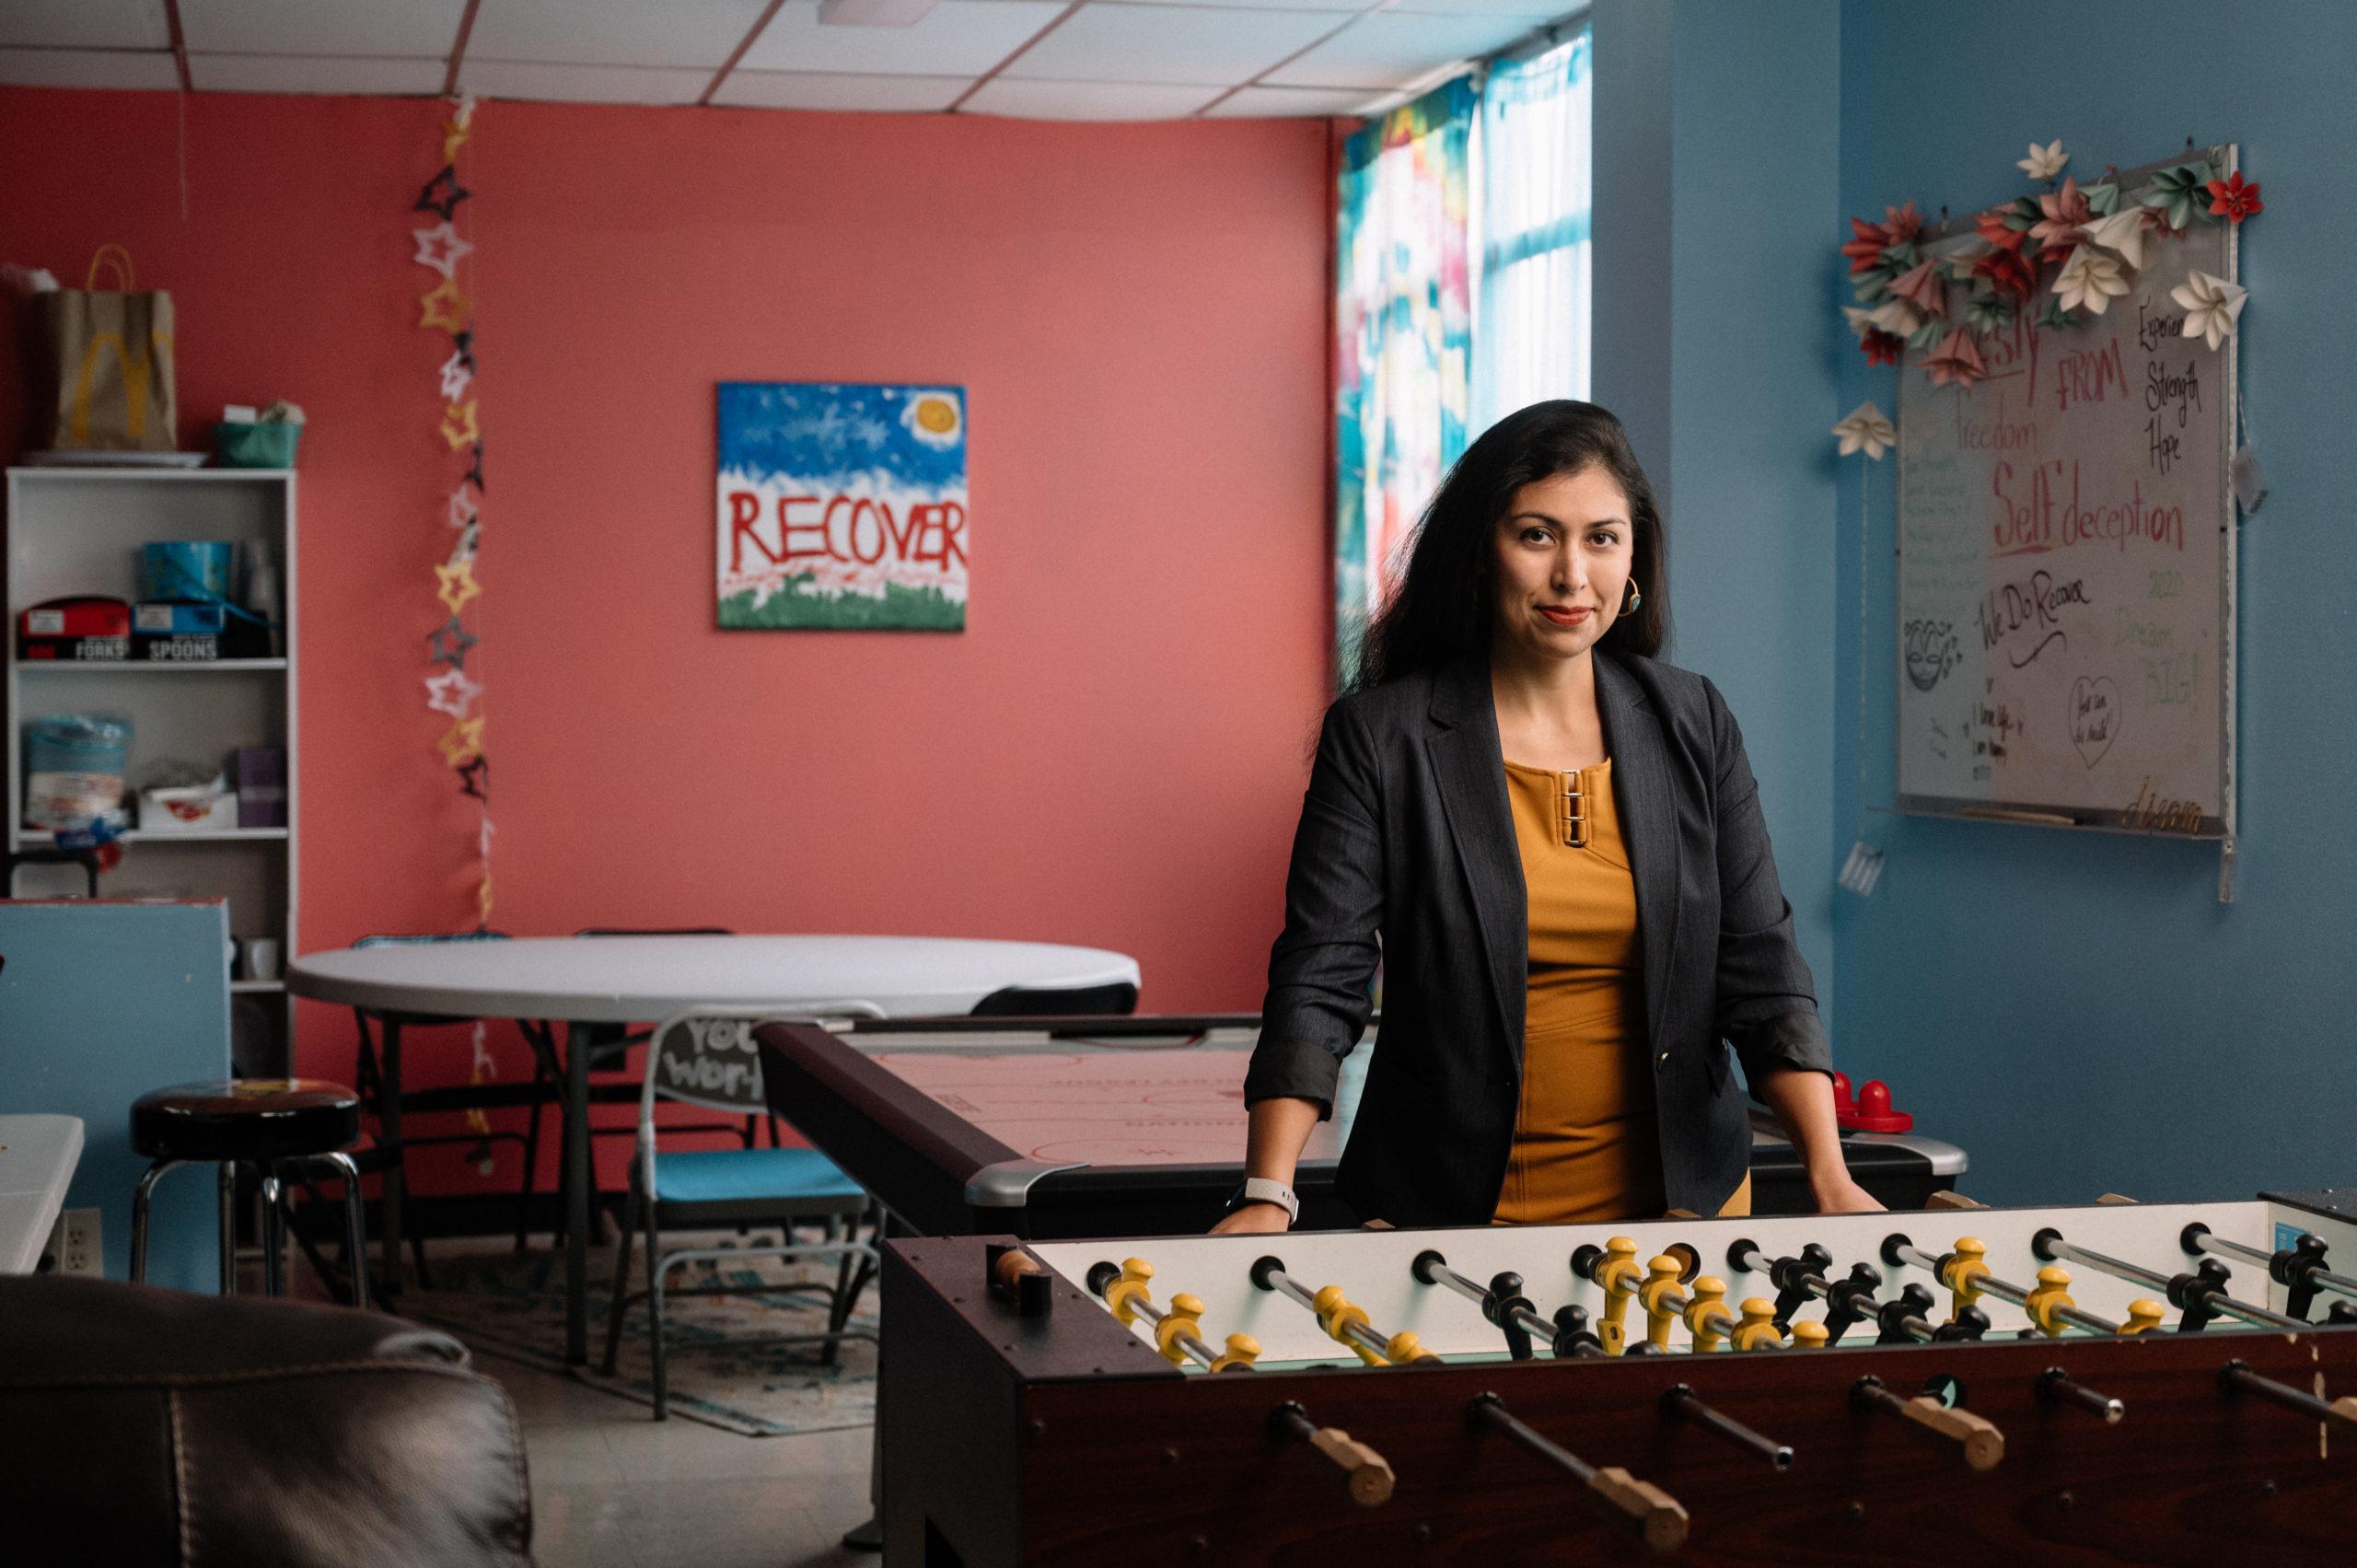 Evita Morin san antonio woman rise recovery treatment nonprofit